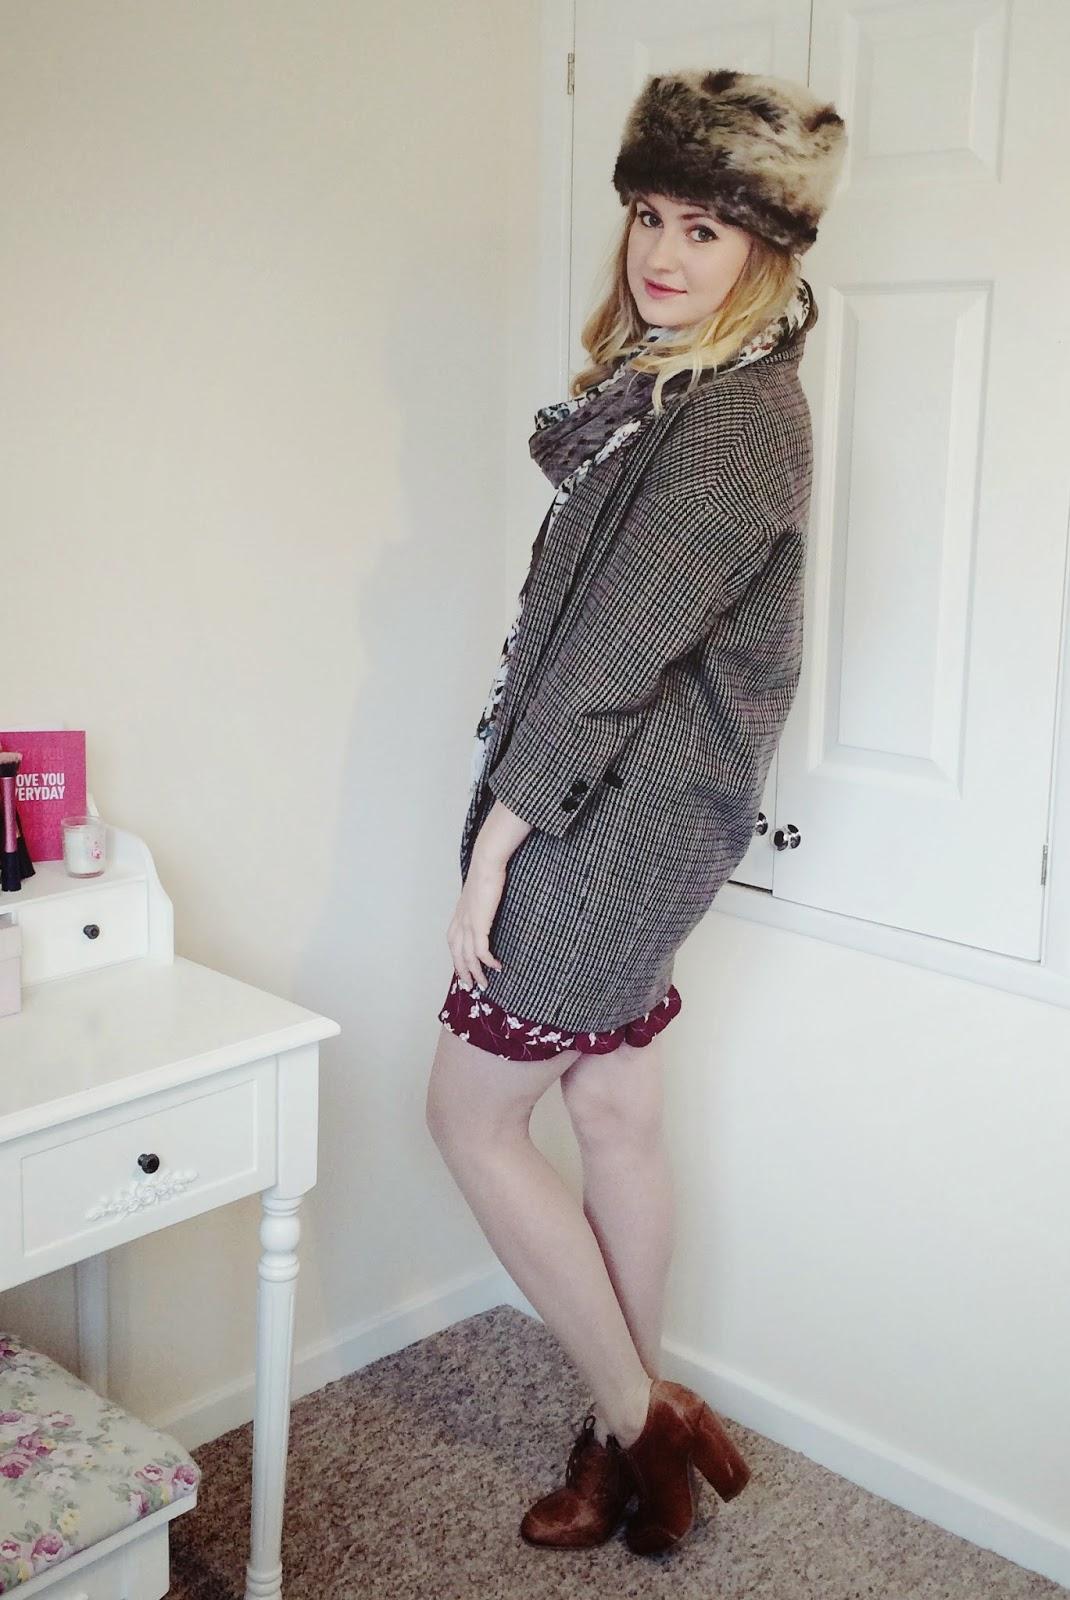 FashionFake, fashion bloggers, UK fashion blog, Sugarhill Boutique dress